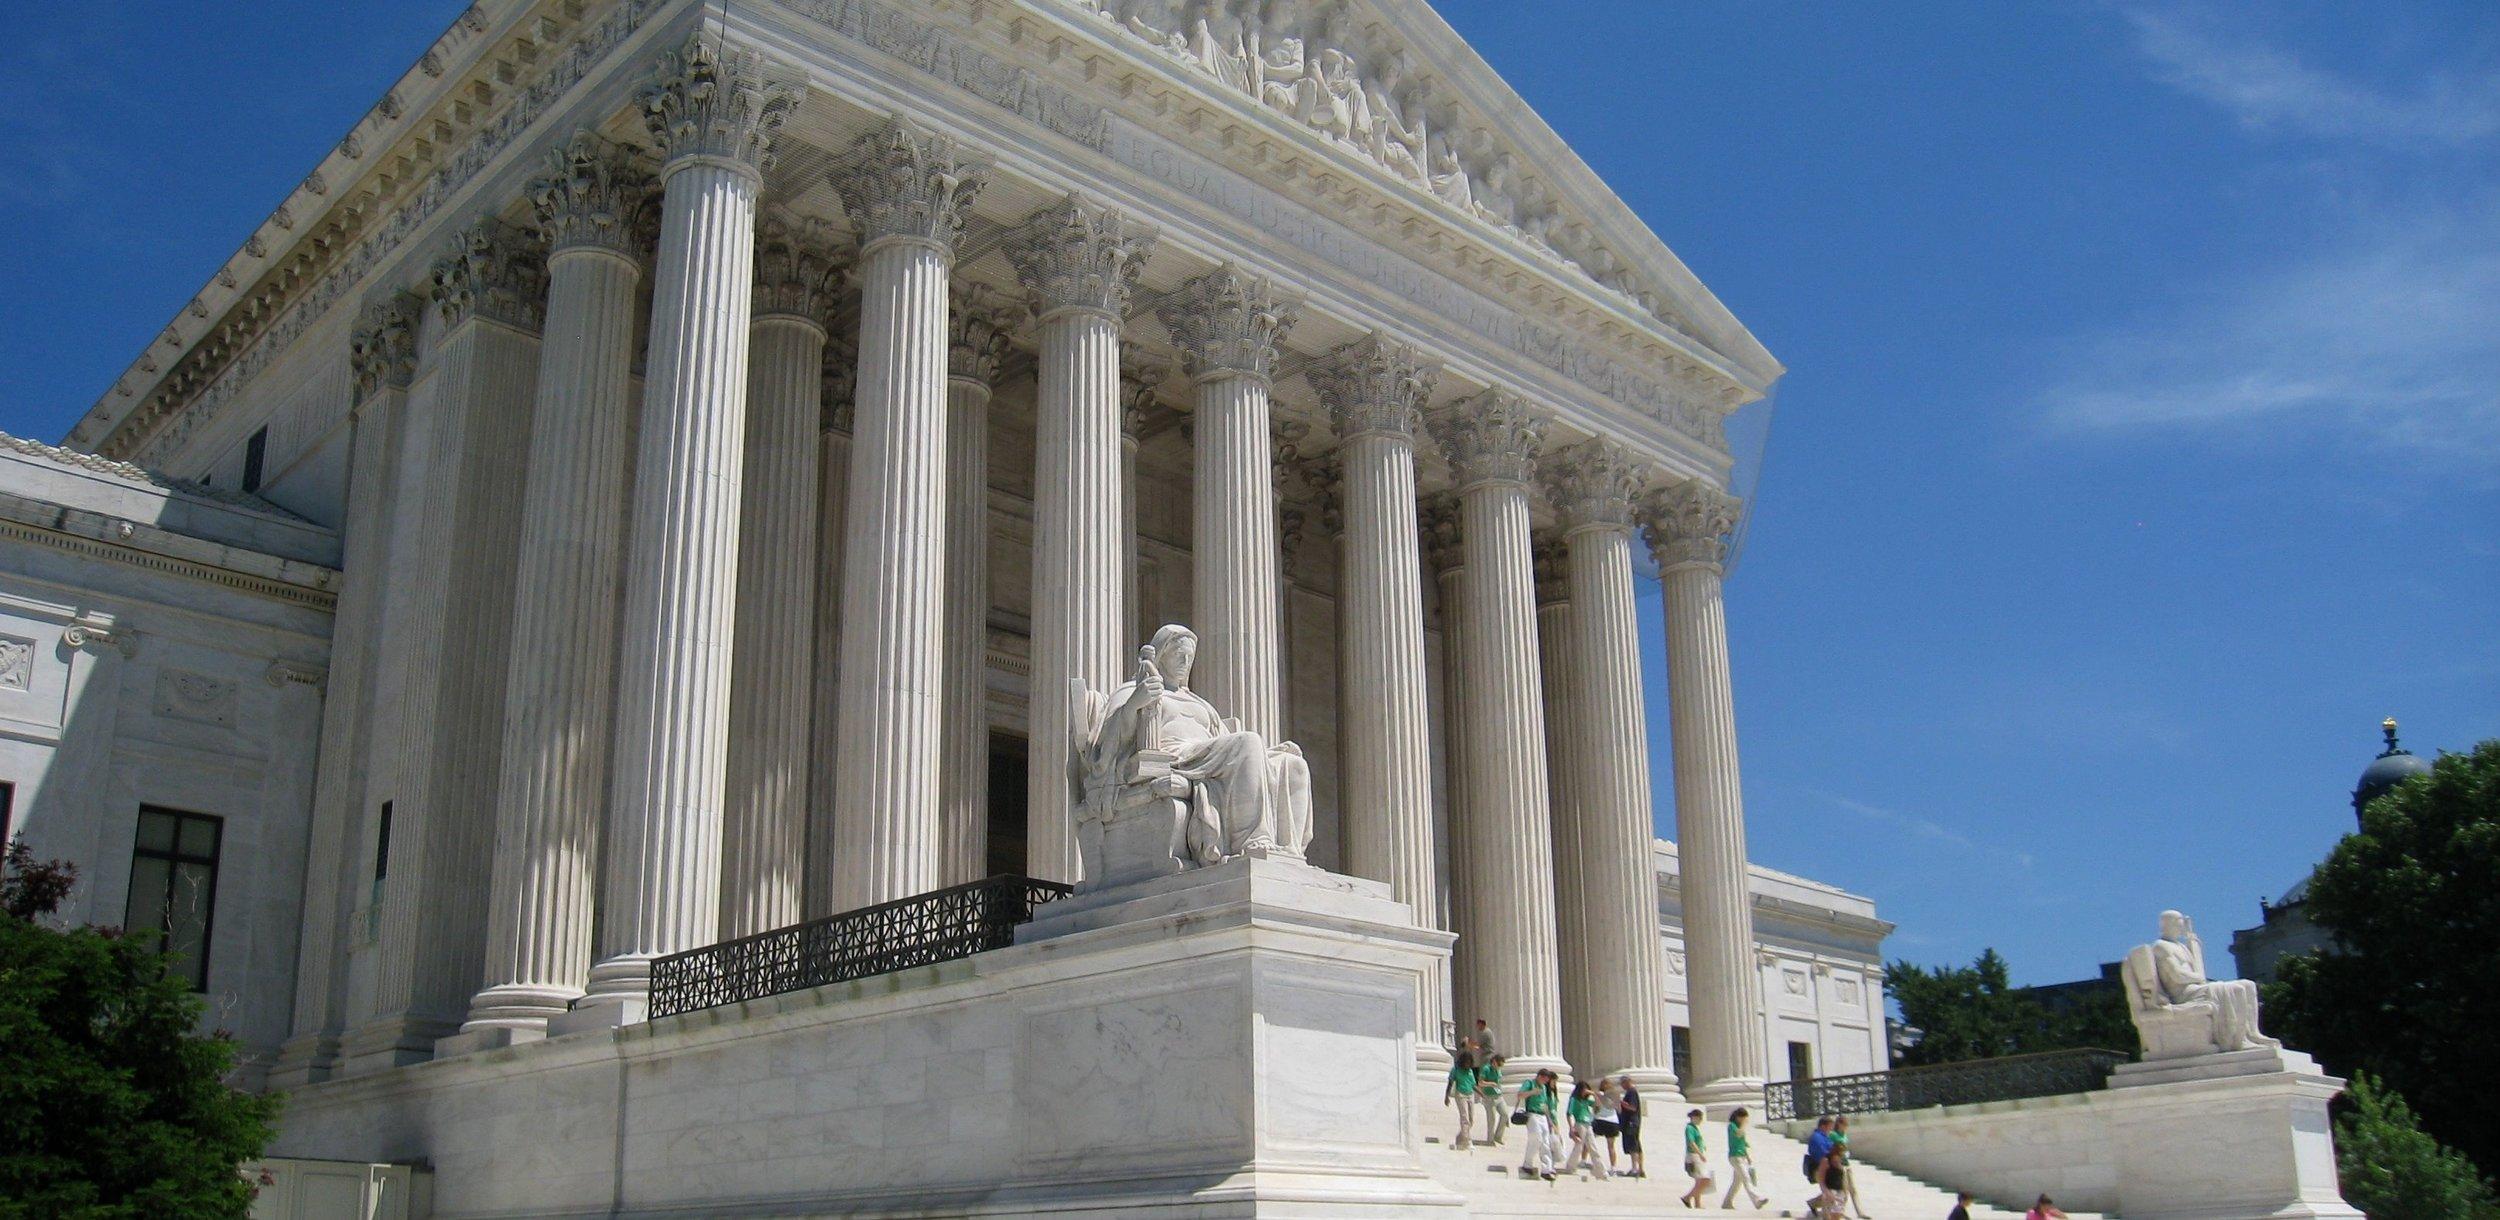 US Supreme Court cropped.jpg